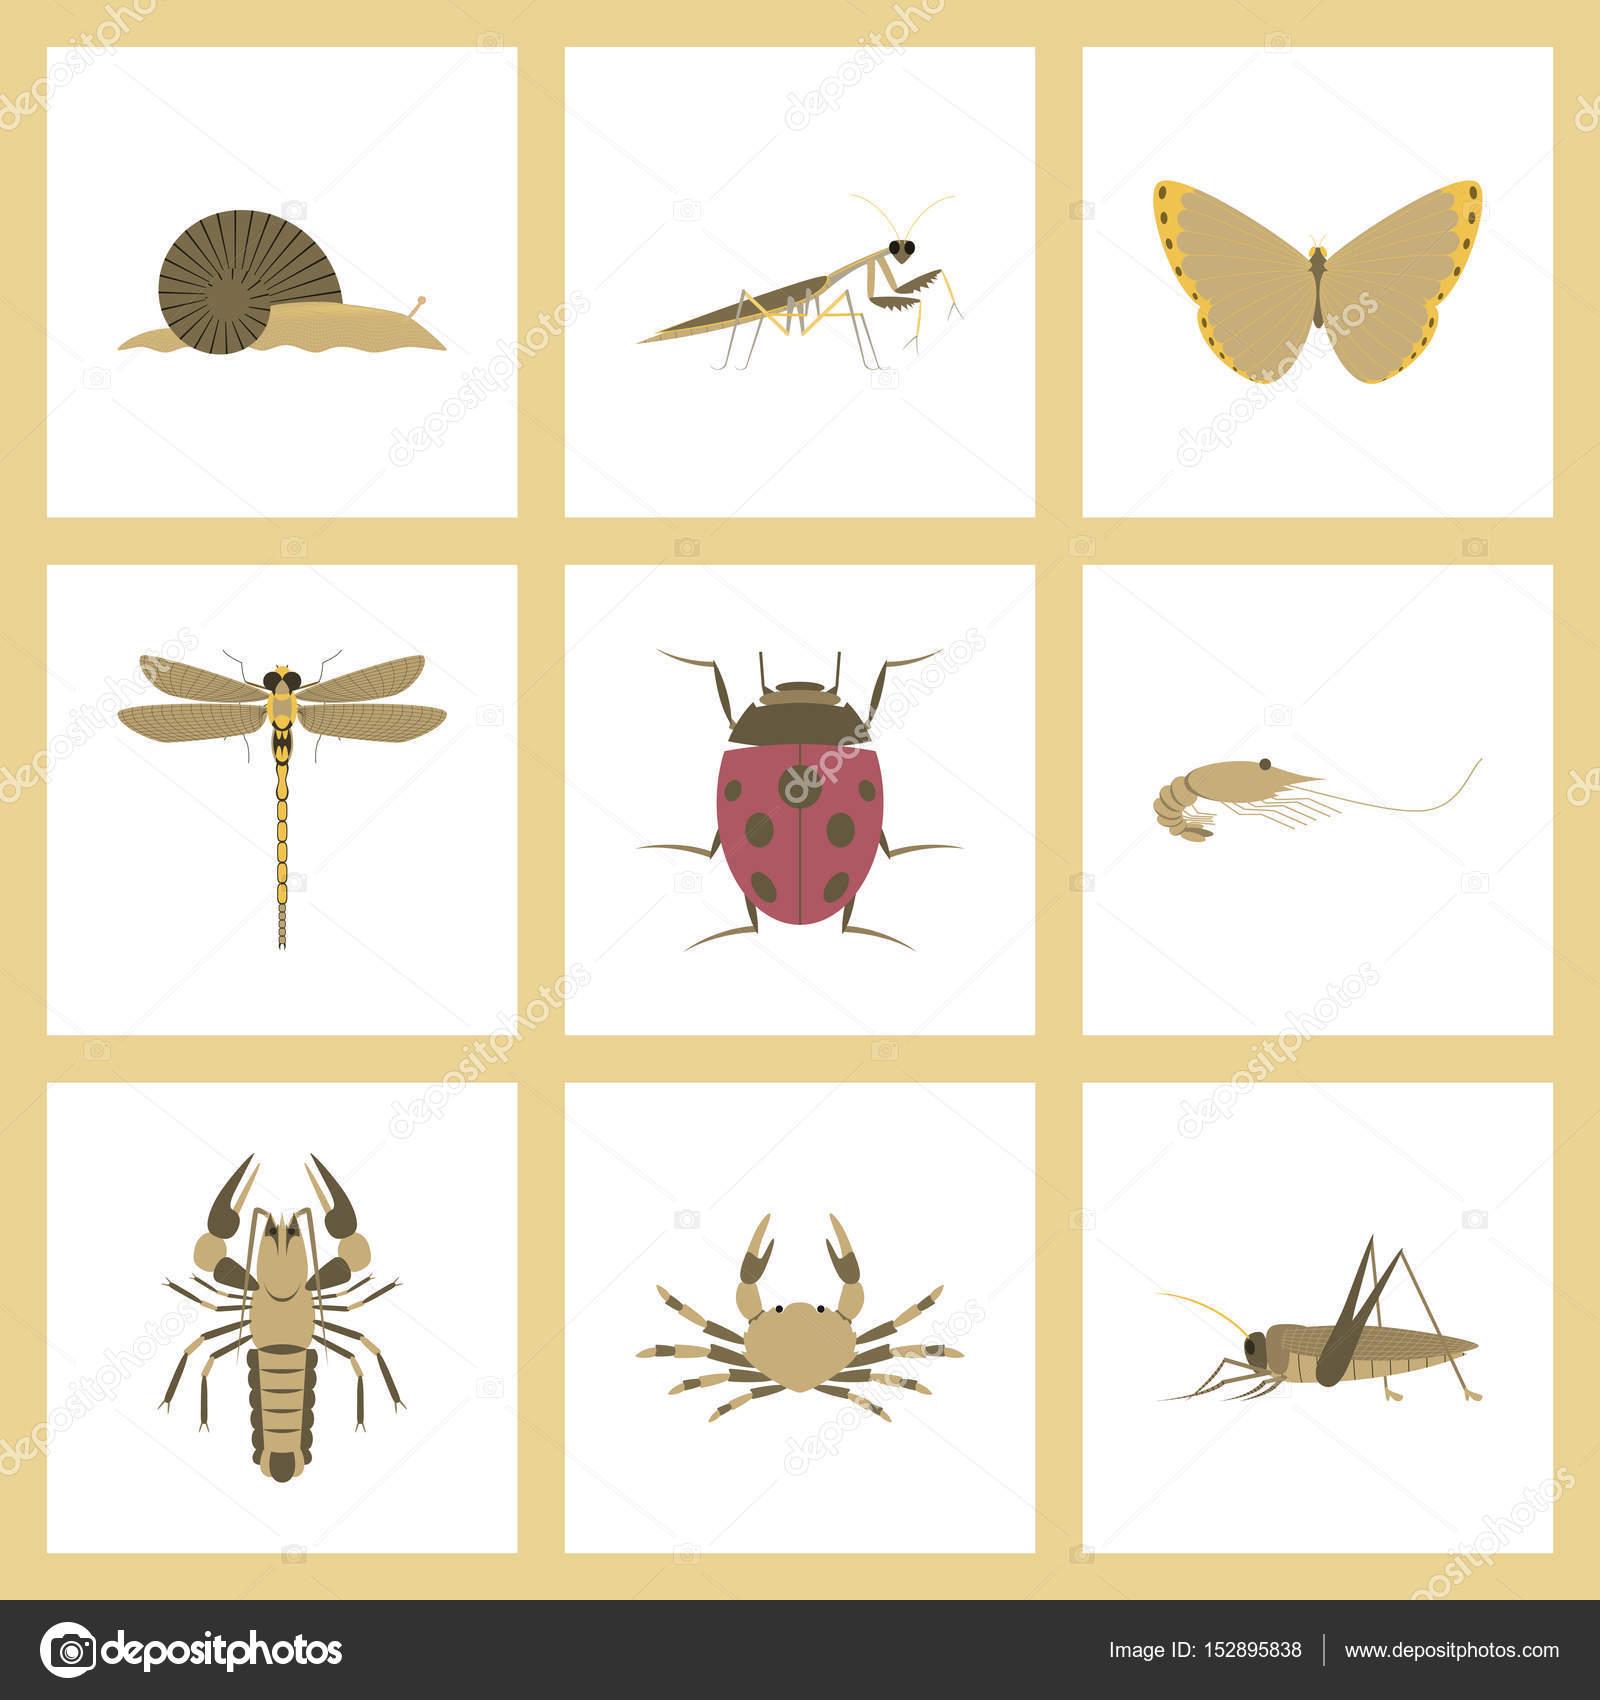 Montaje plano ilustraciones error caracol mariposa libélula ...